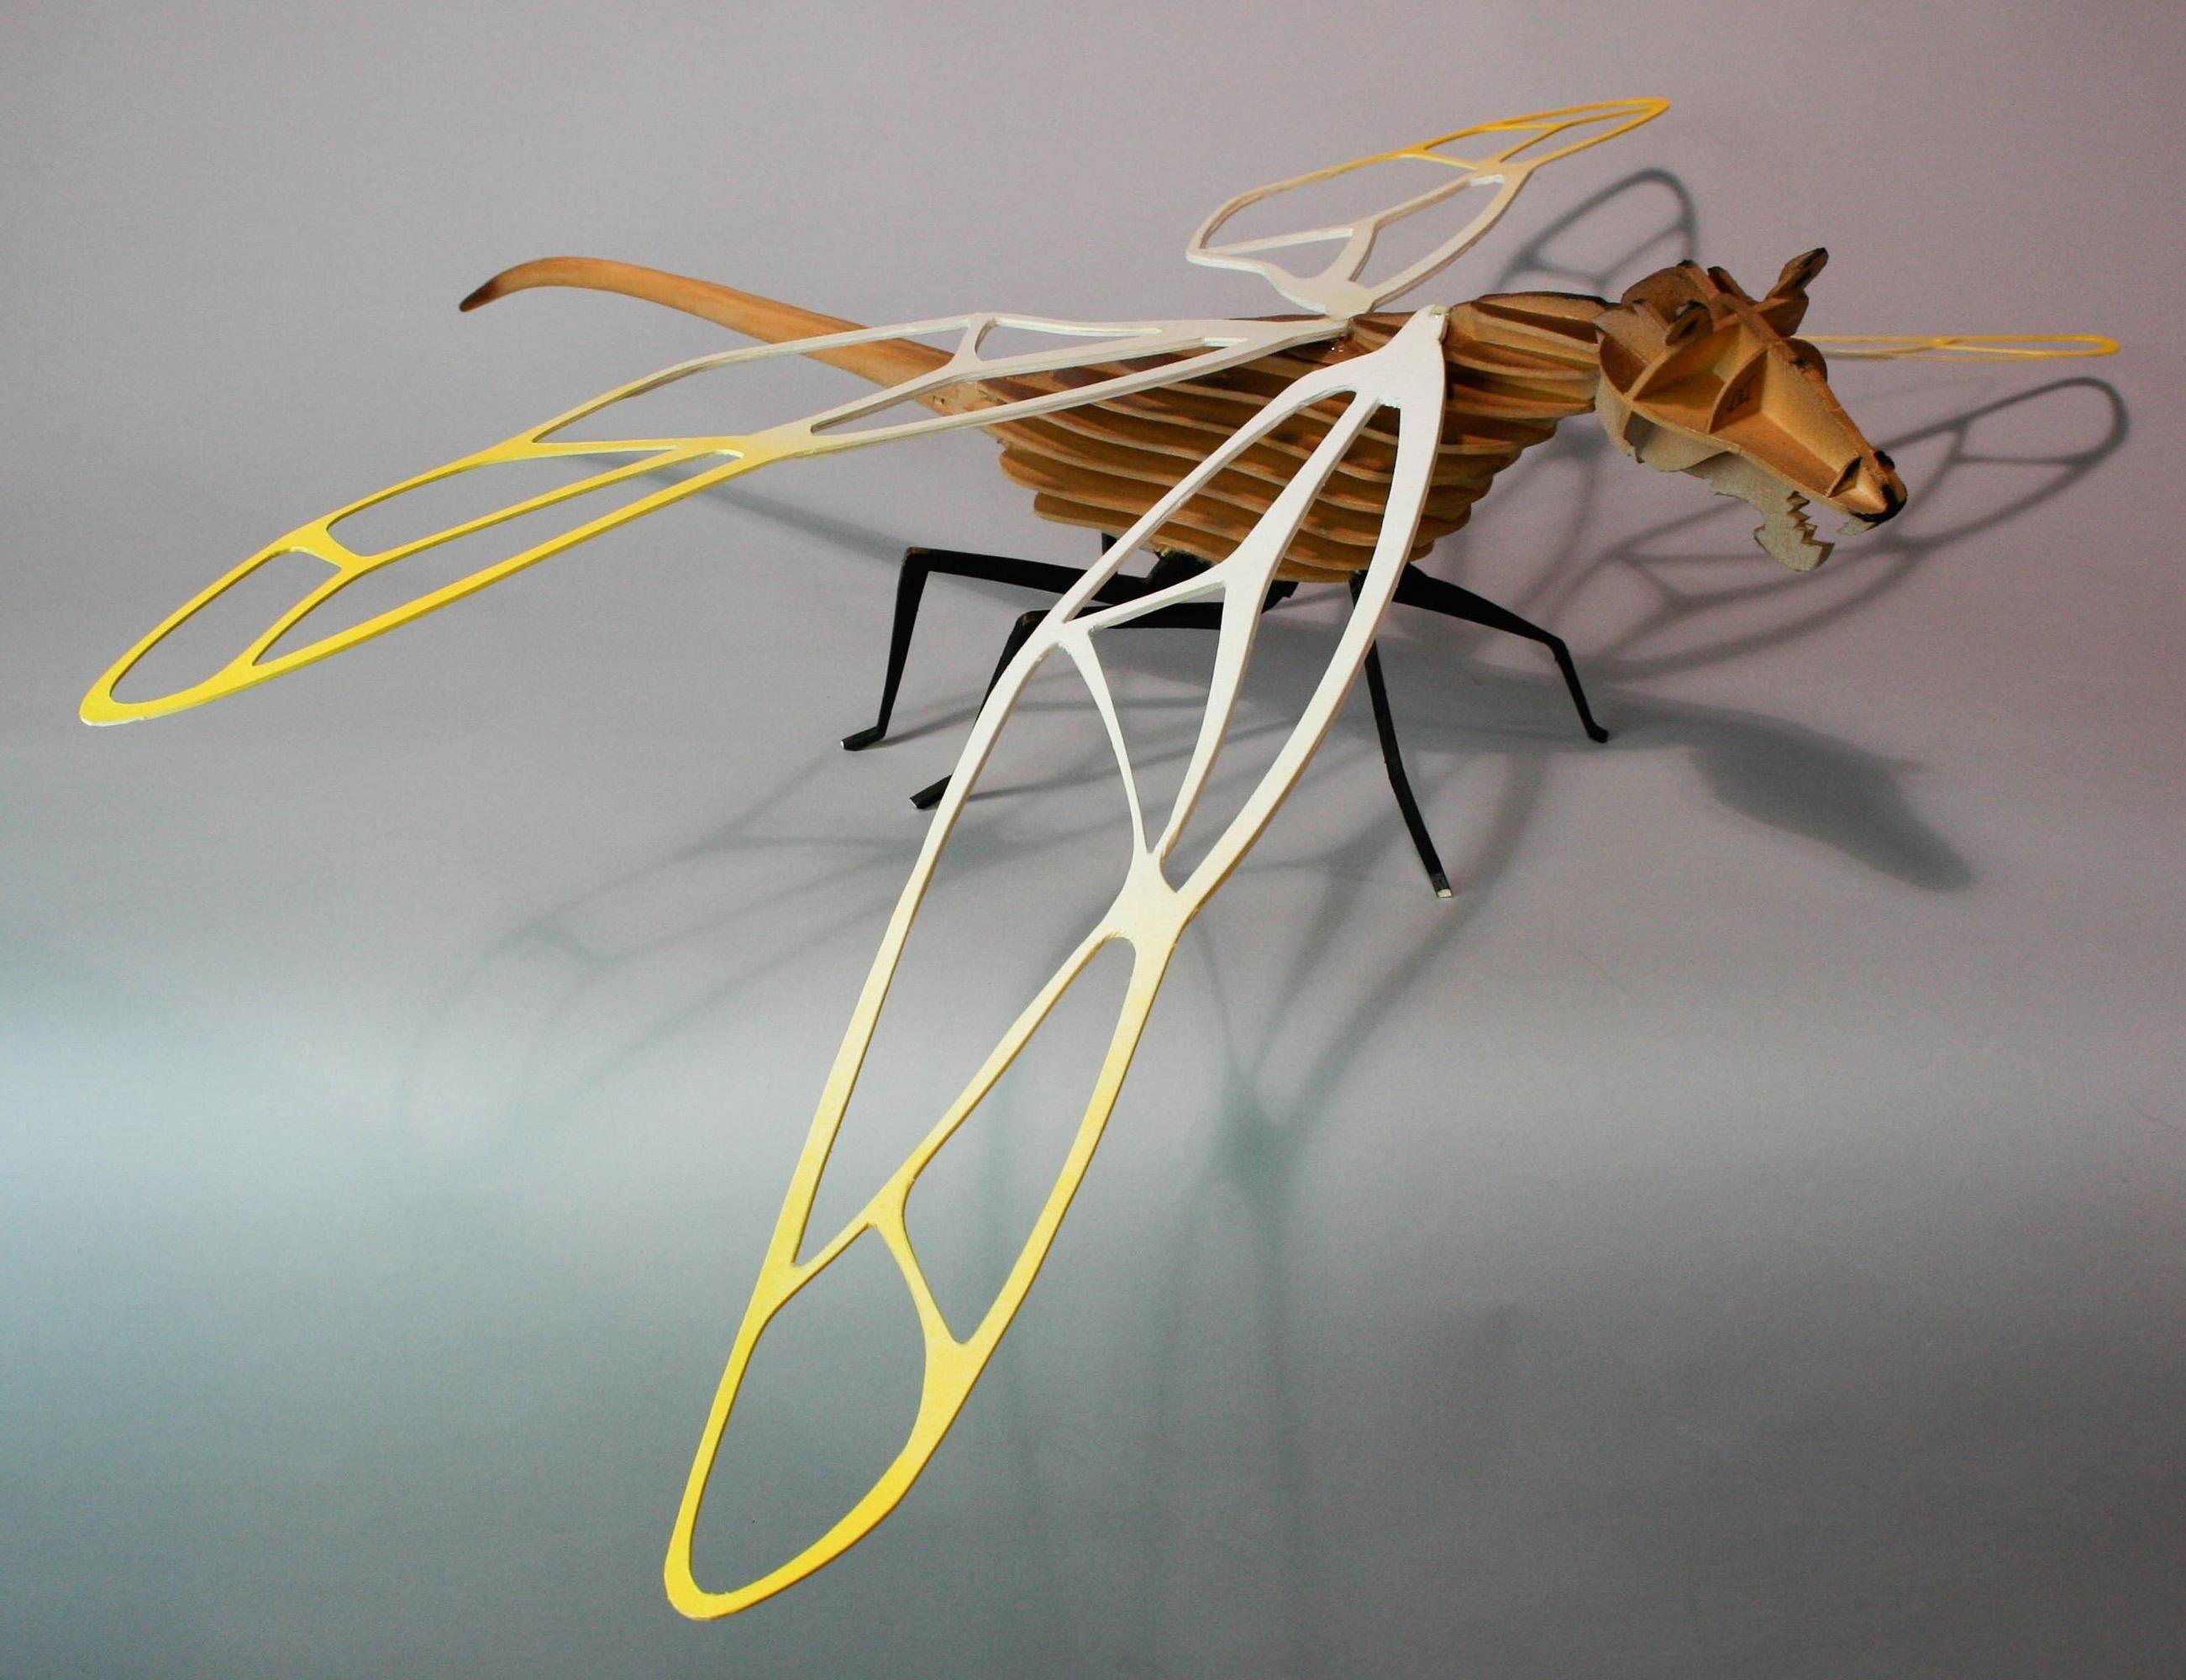 Ladybug sculpture made from cardboard